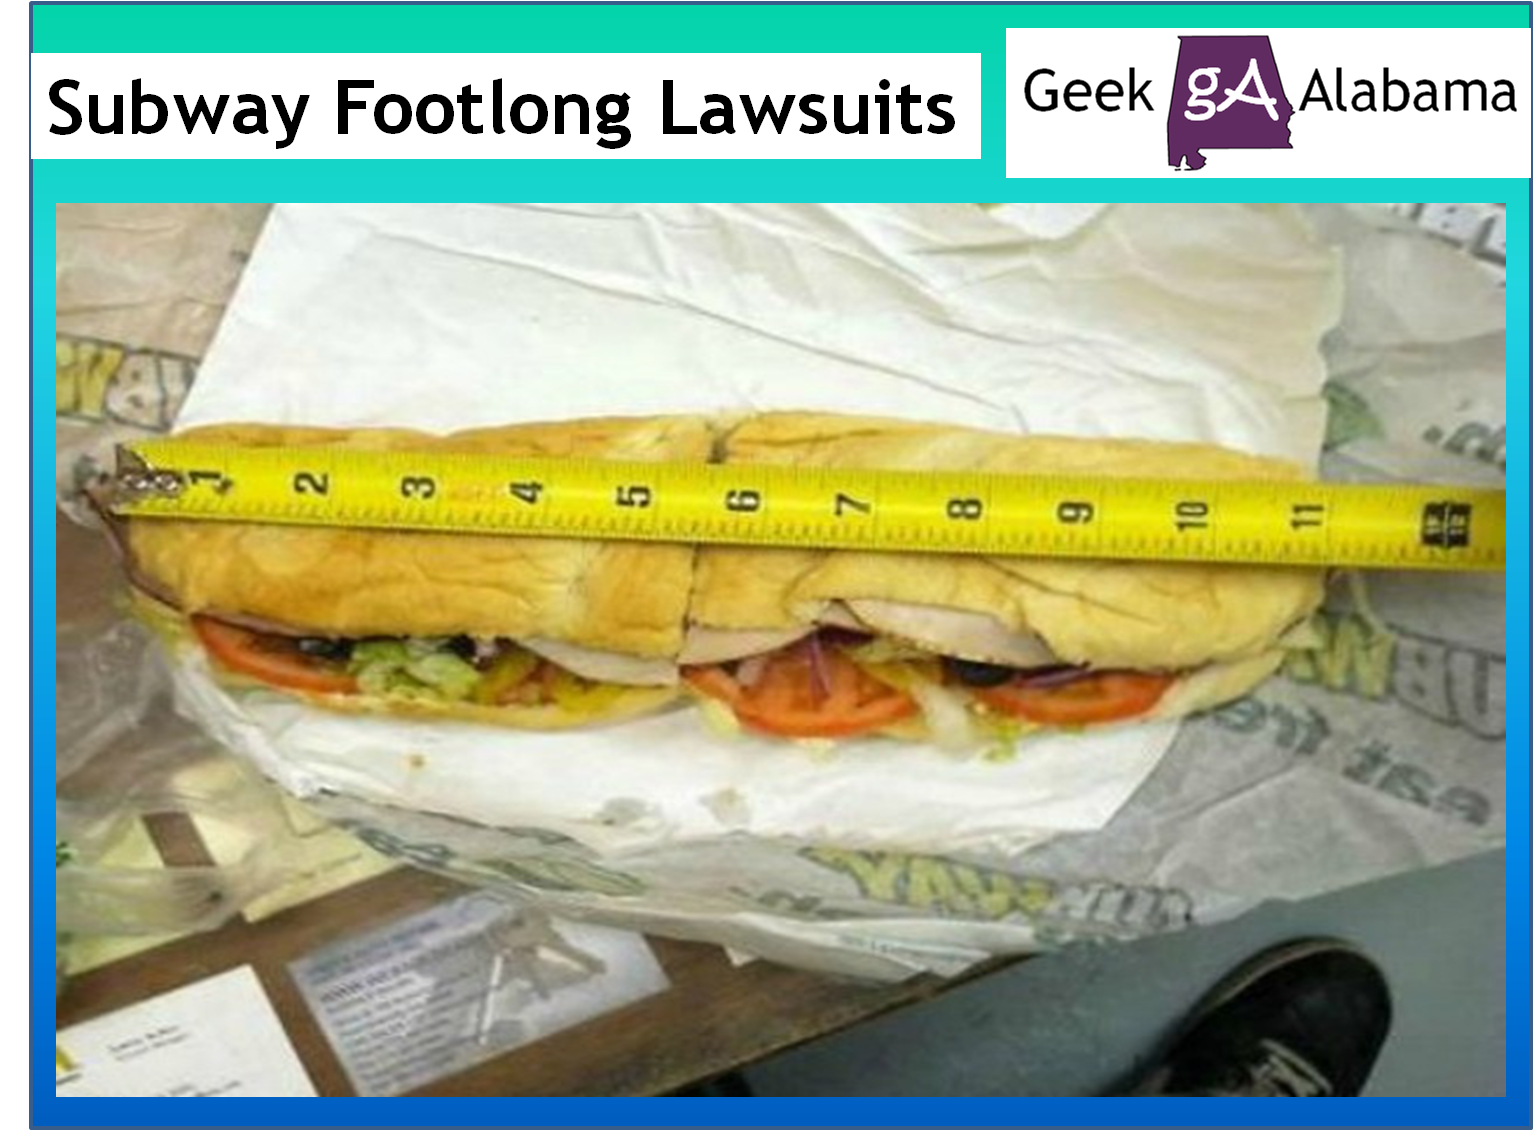 The Subway Footlong Lawsuits Geek Alabama